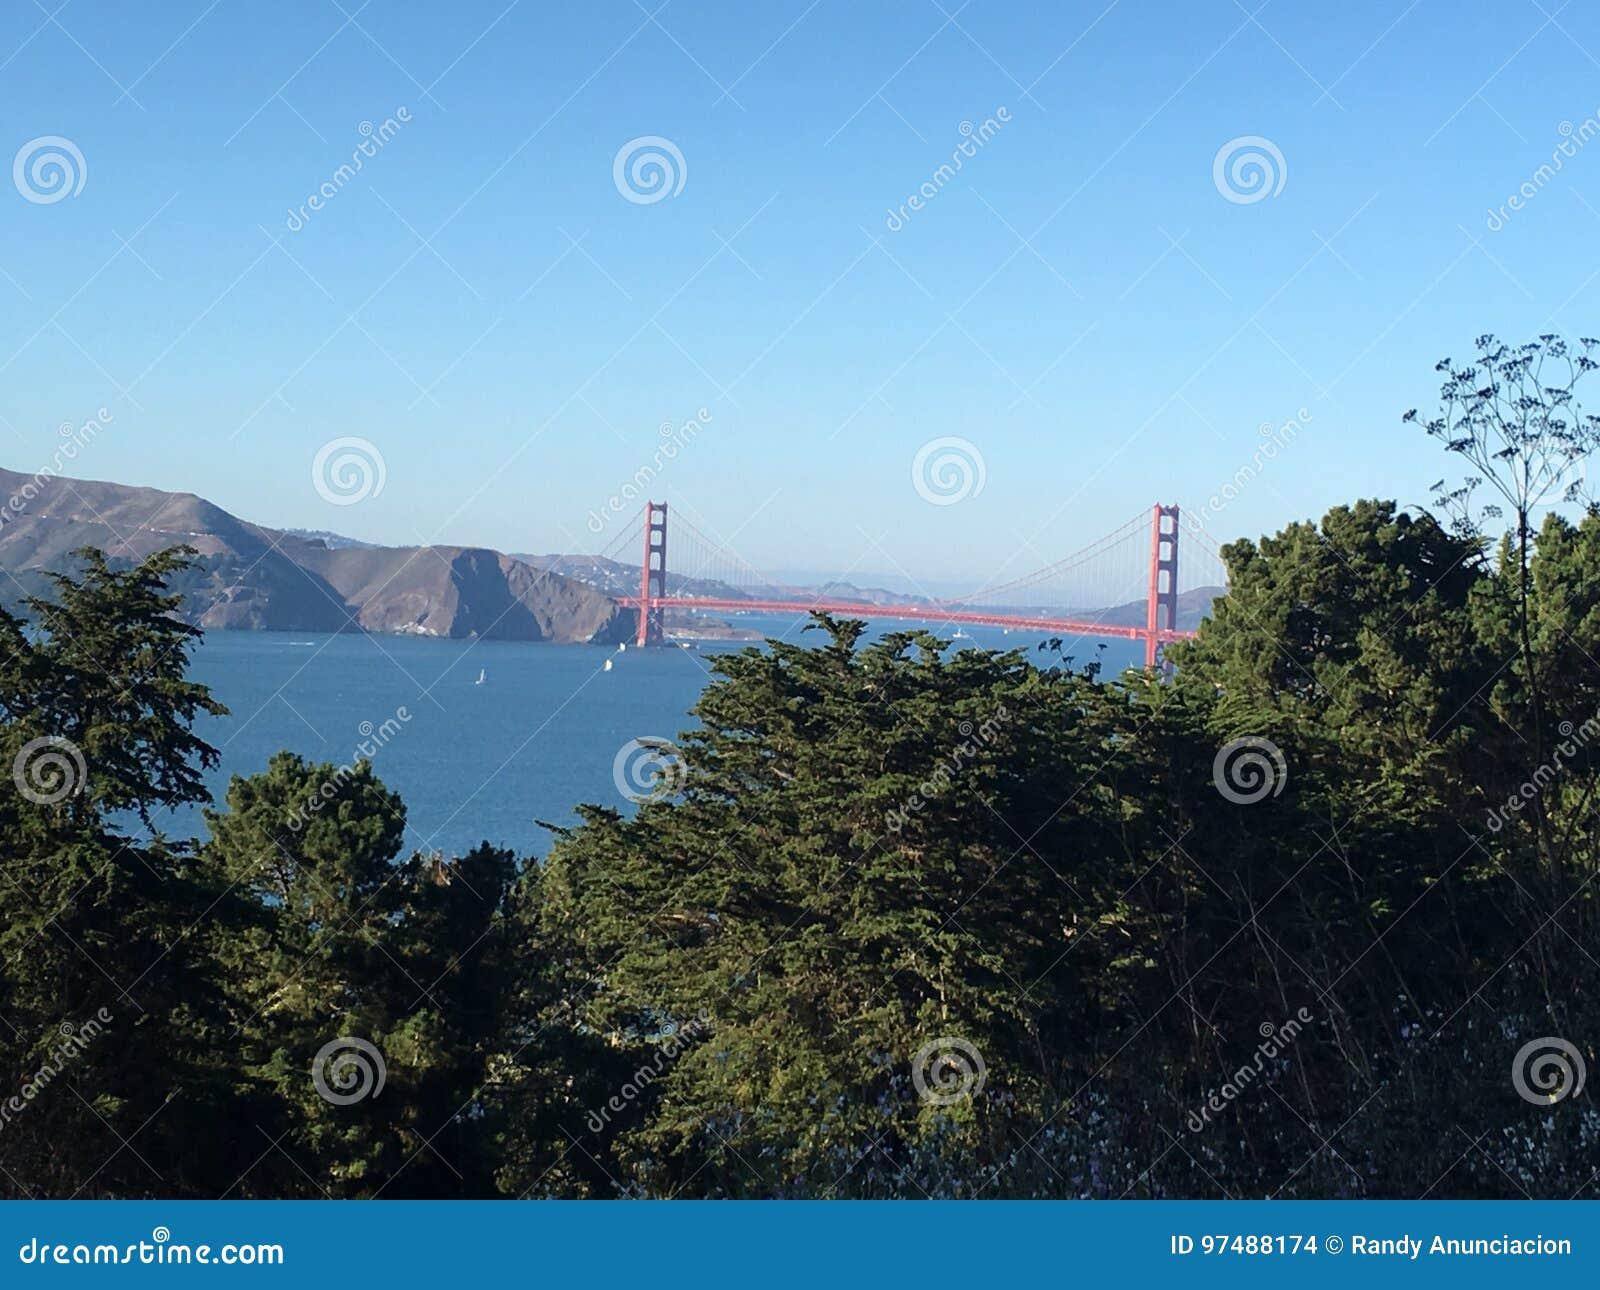 Golden Gate, San Francisco Ca